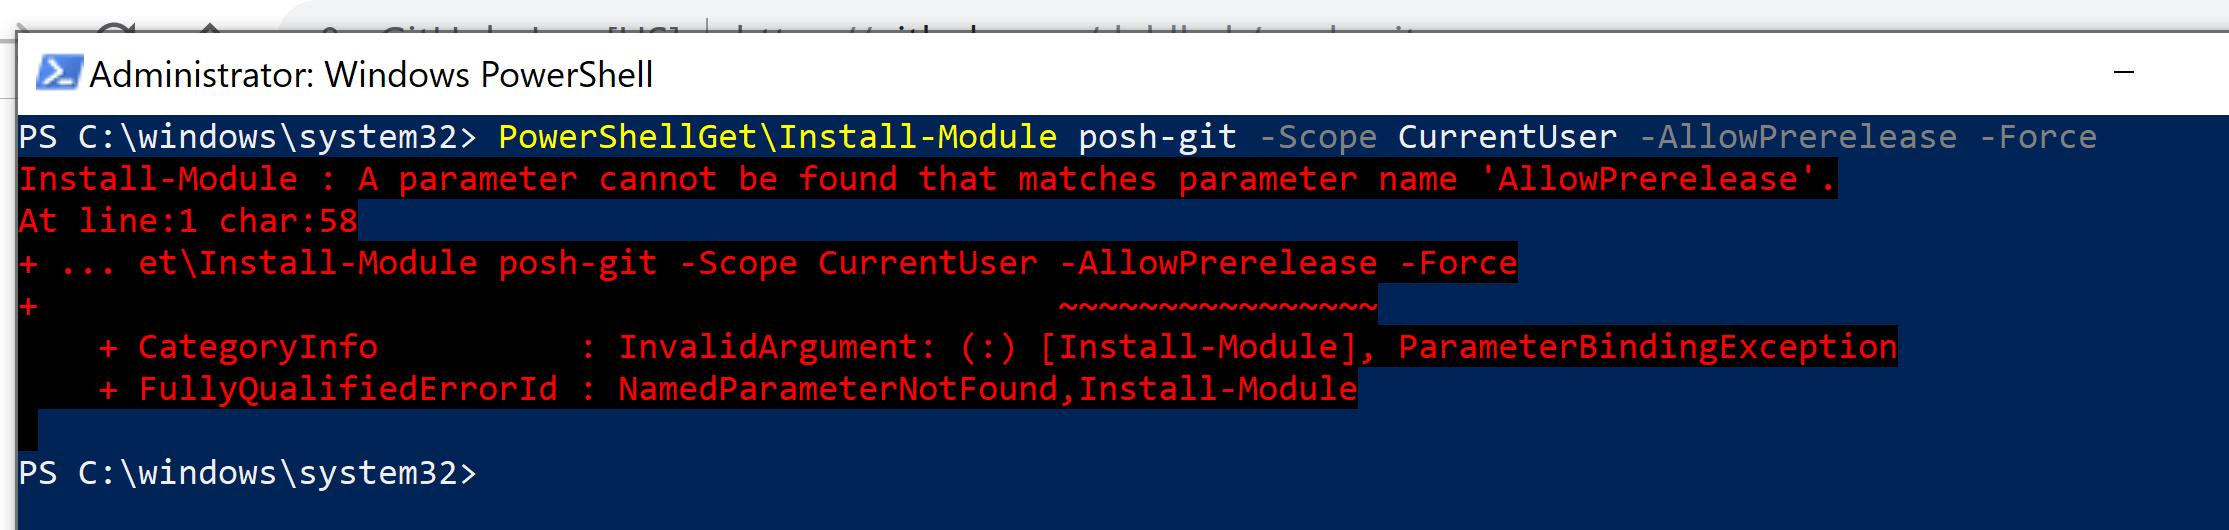 PowerShell PostGit install command